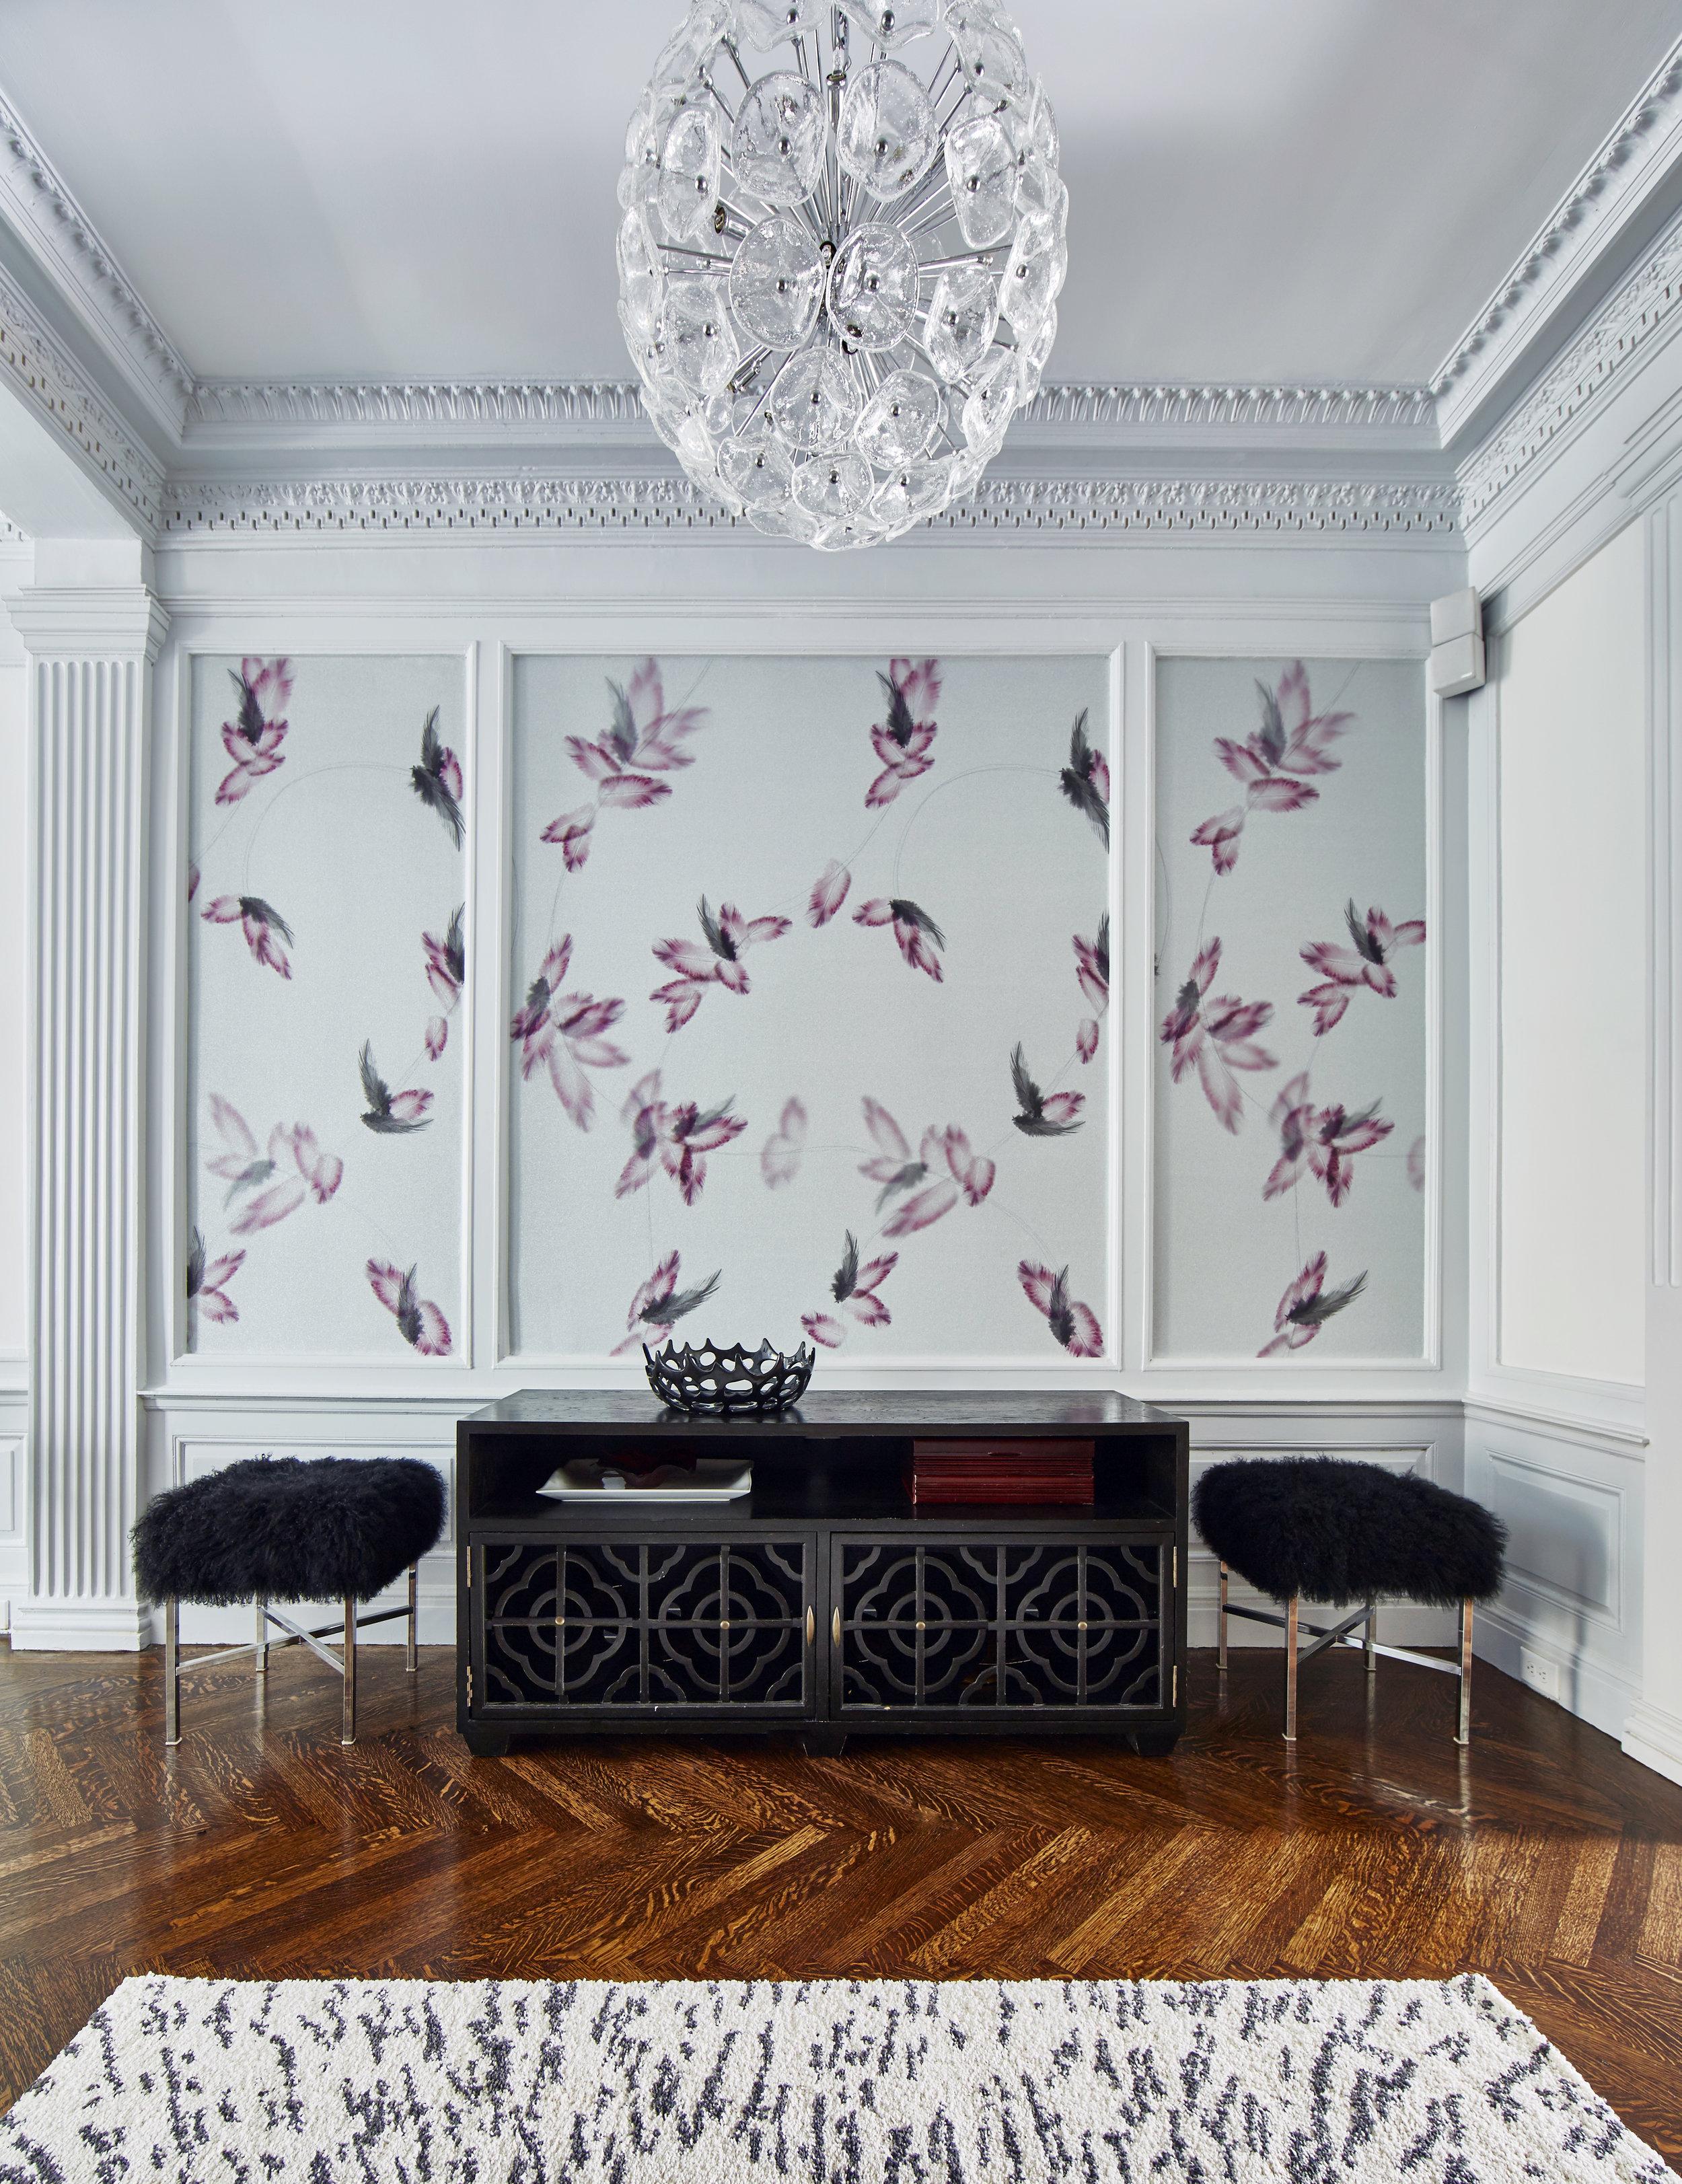 Vintage-Stool-Trove-Wallpaper-JMorris-Design-Interior-Designer-Brooklyn-New-York-Online.jpg